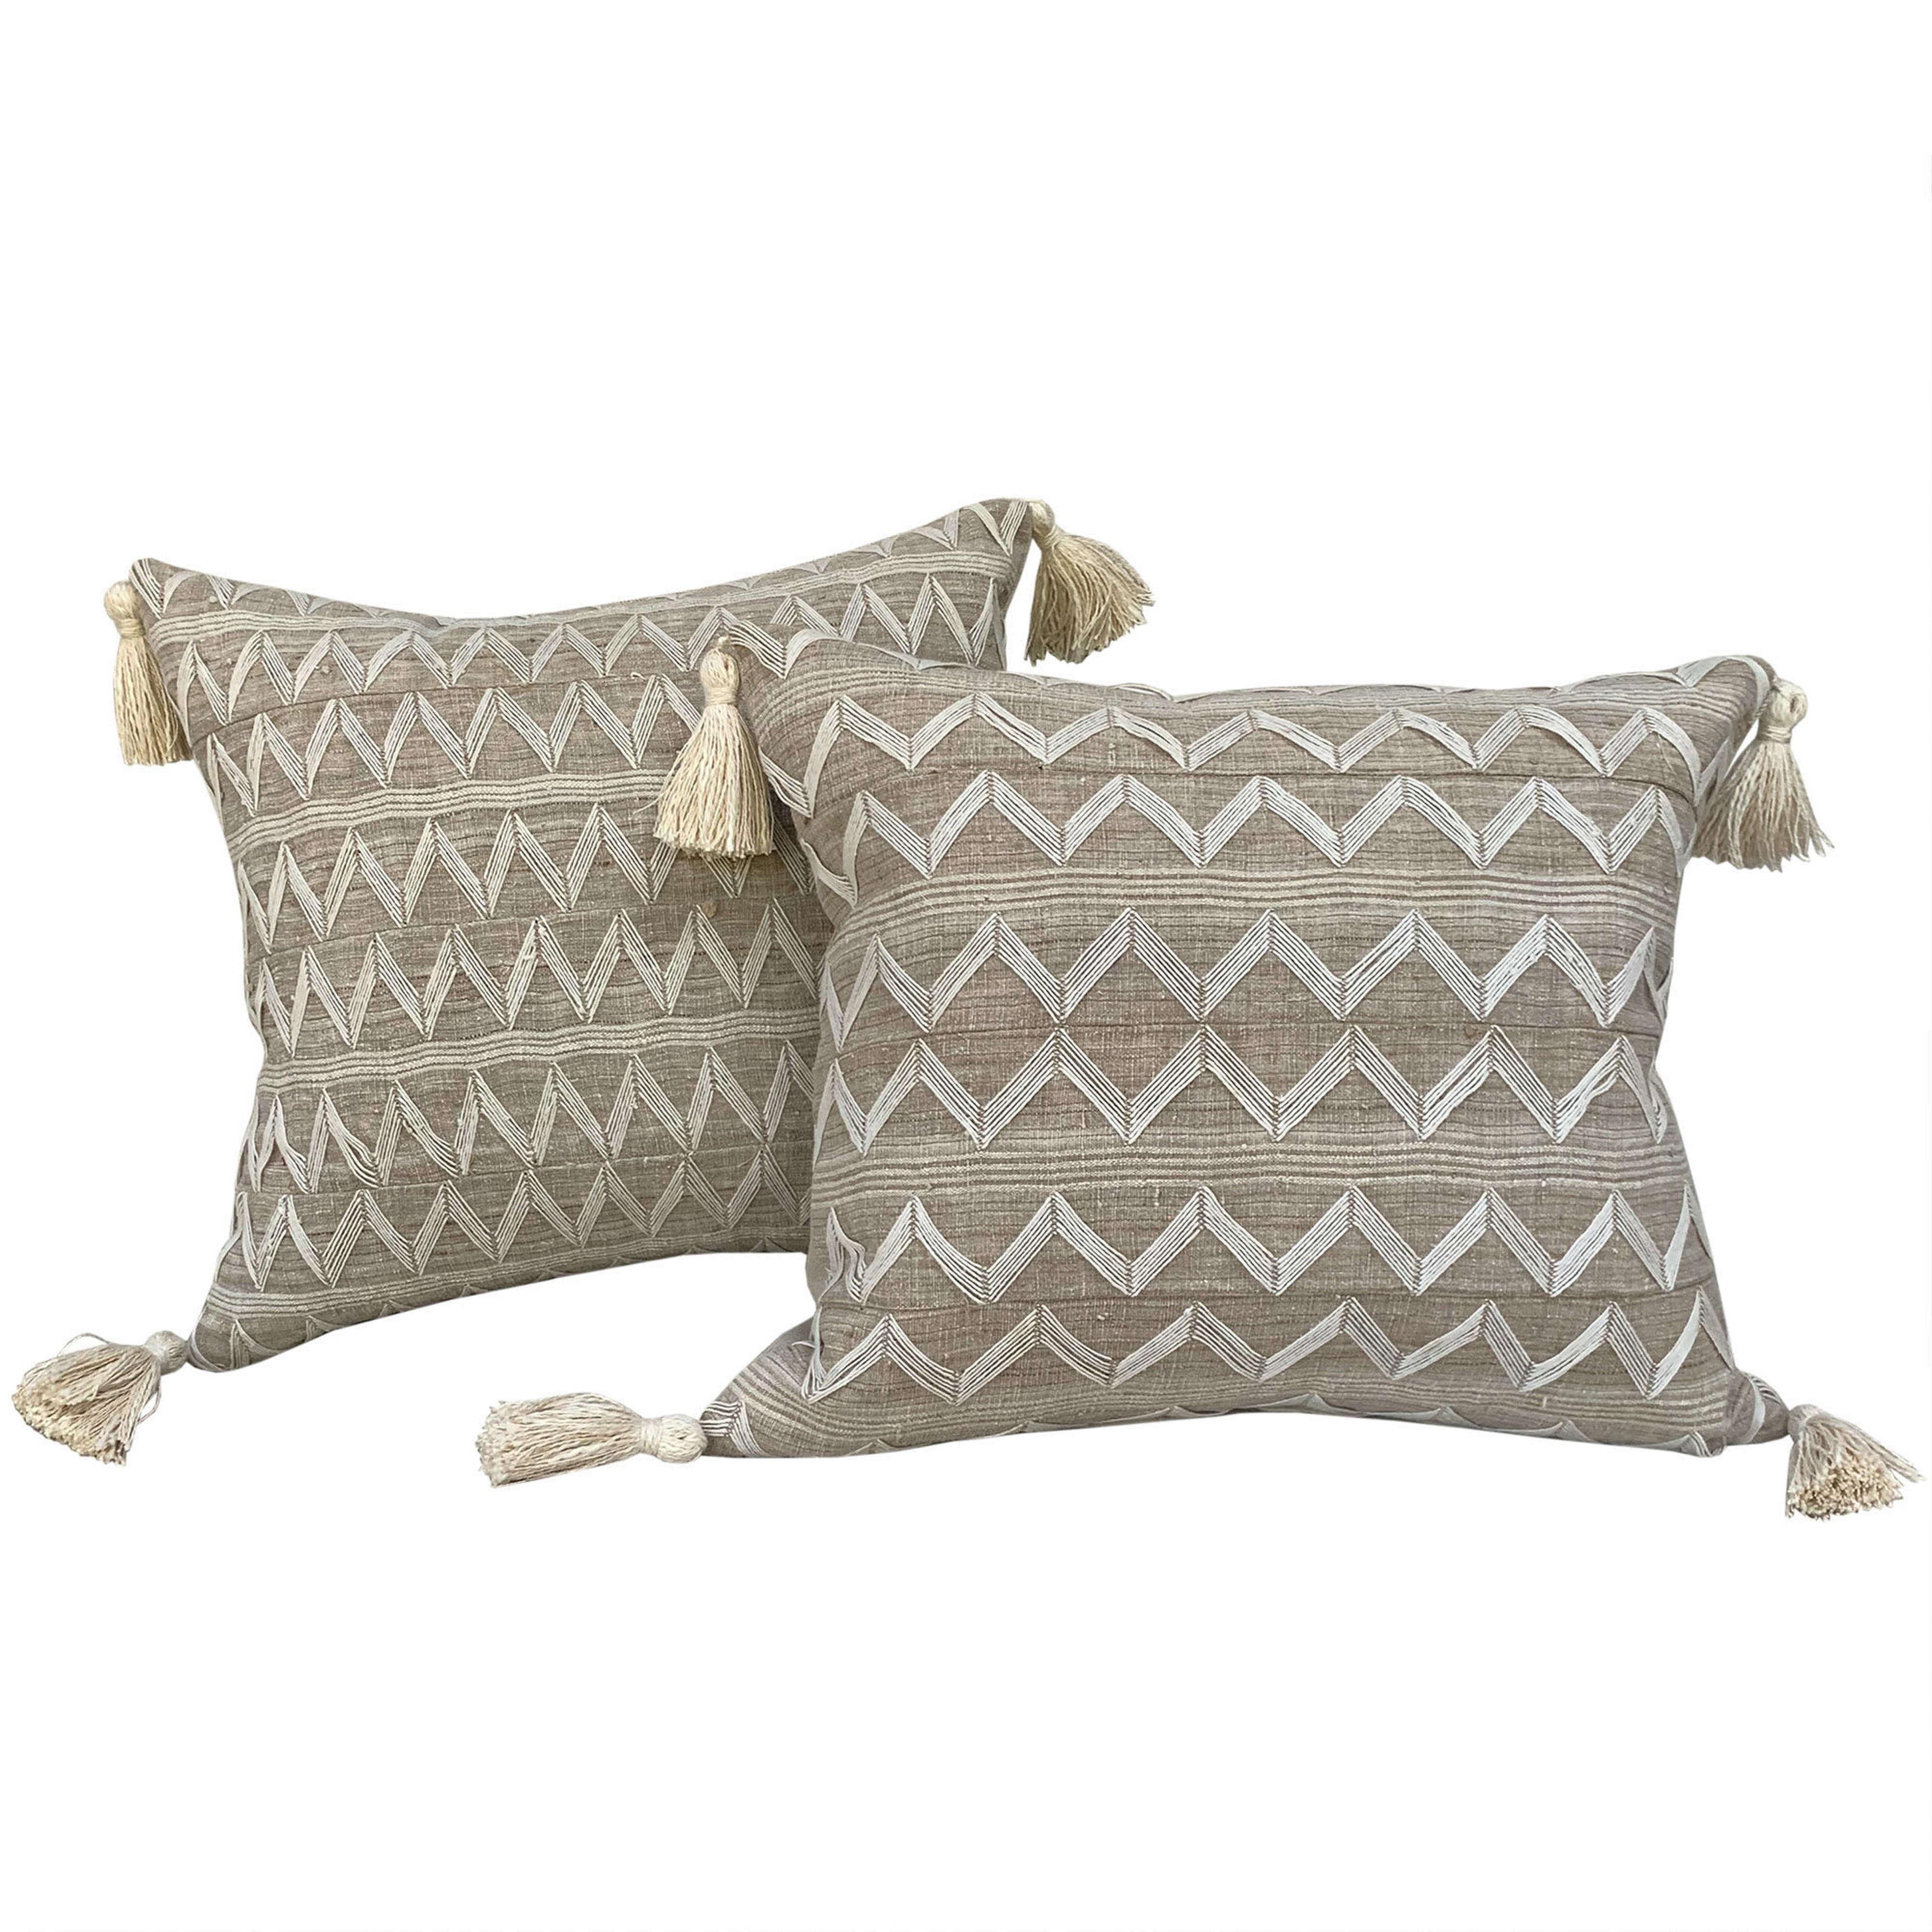 Beige Yoruba zig zag cushions